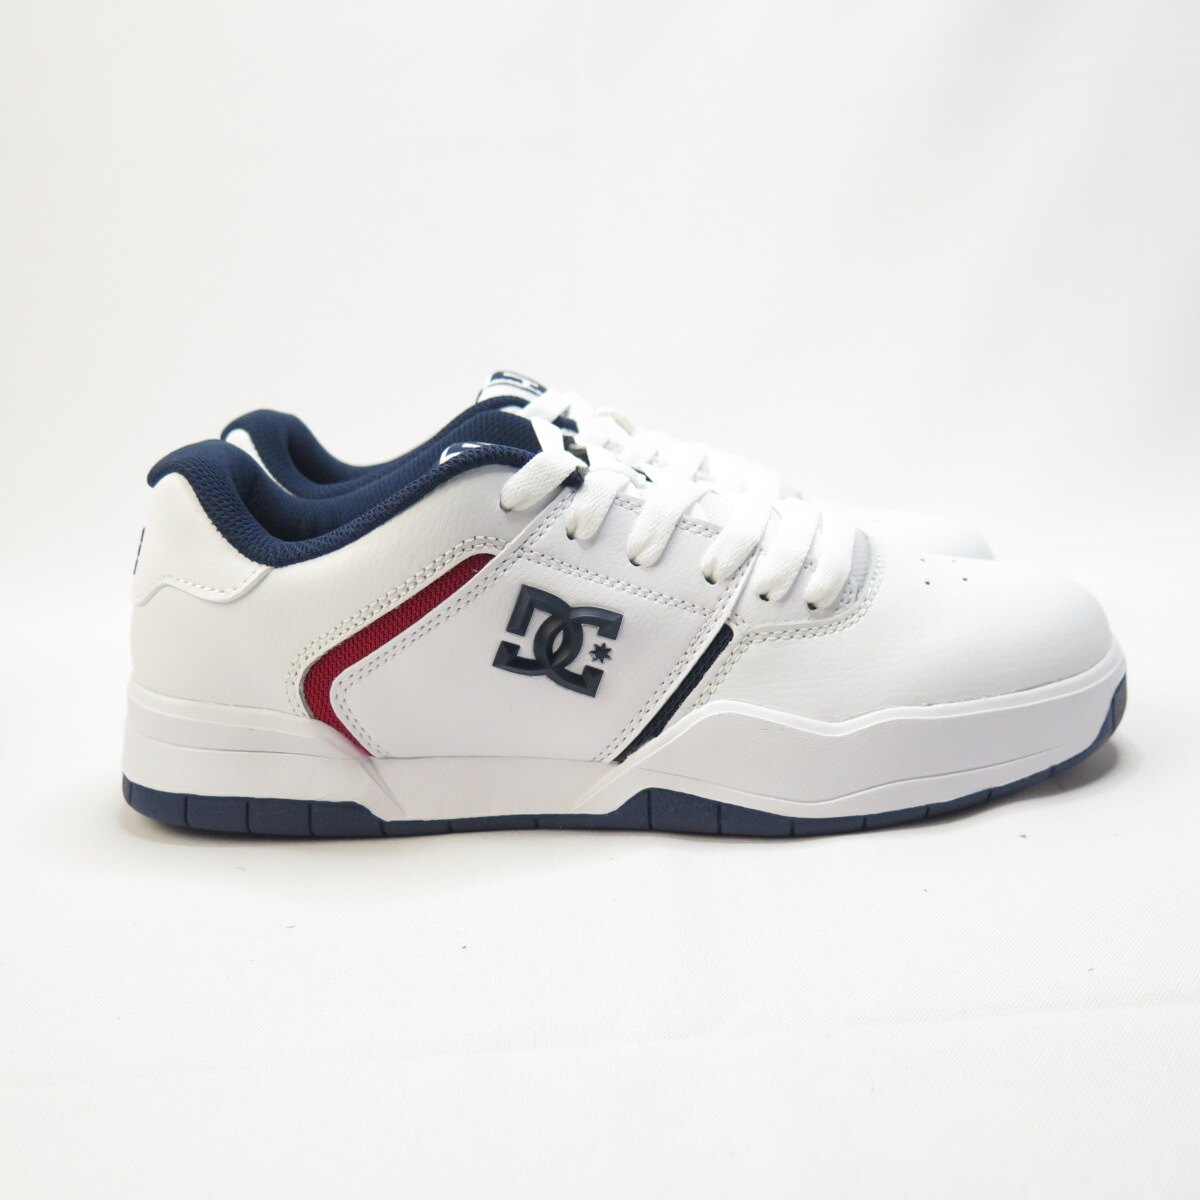 【滿額領券折$150】DC CENTRAL 休閒鞋 公司貨 100551XWWB 男款 白藍【iSport愛運動】